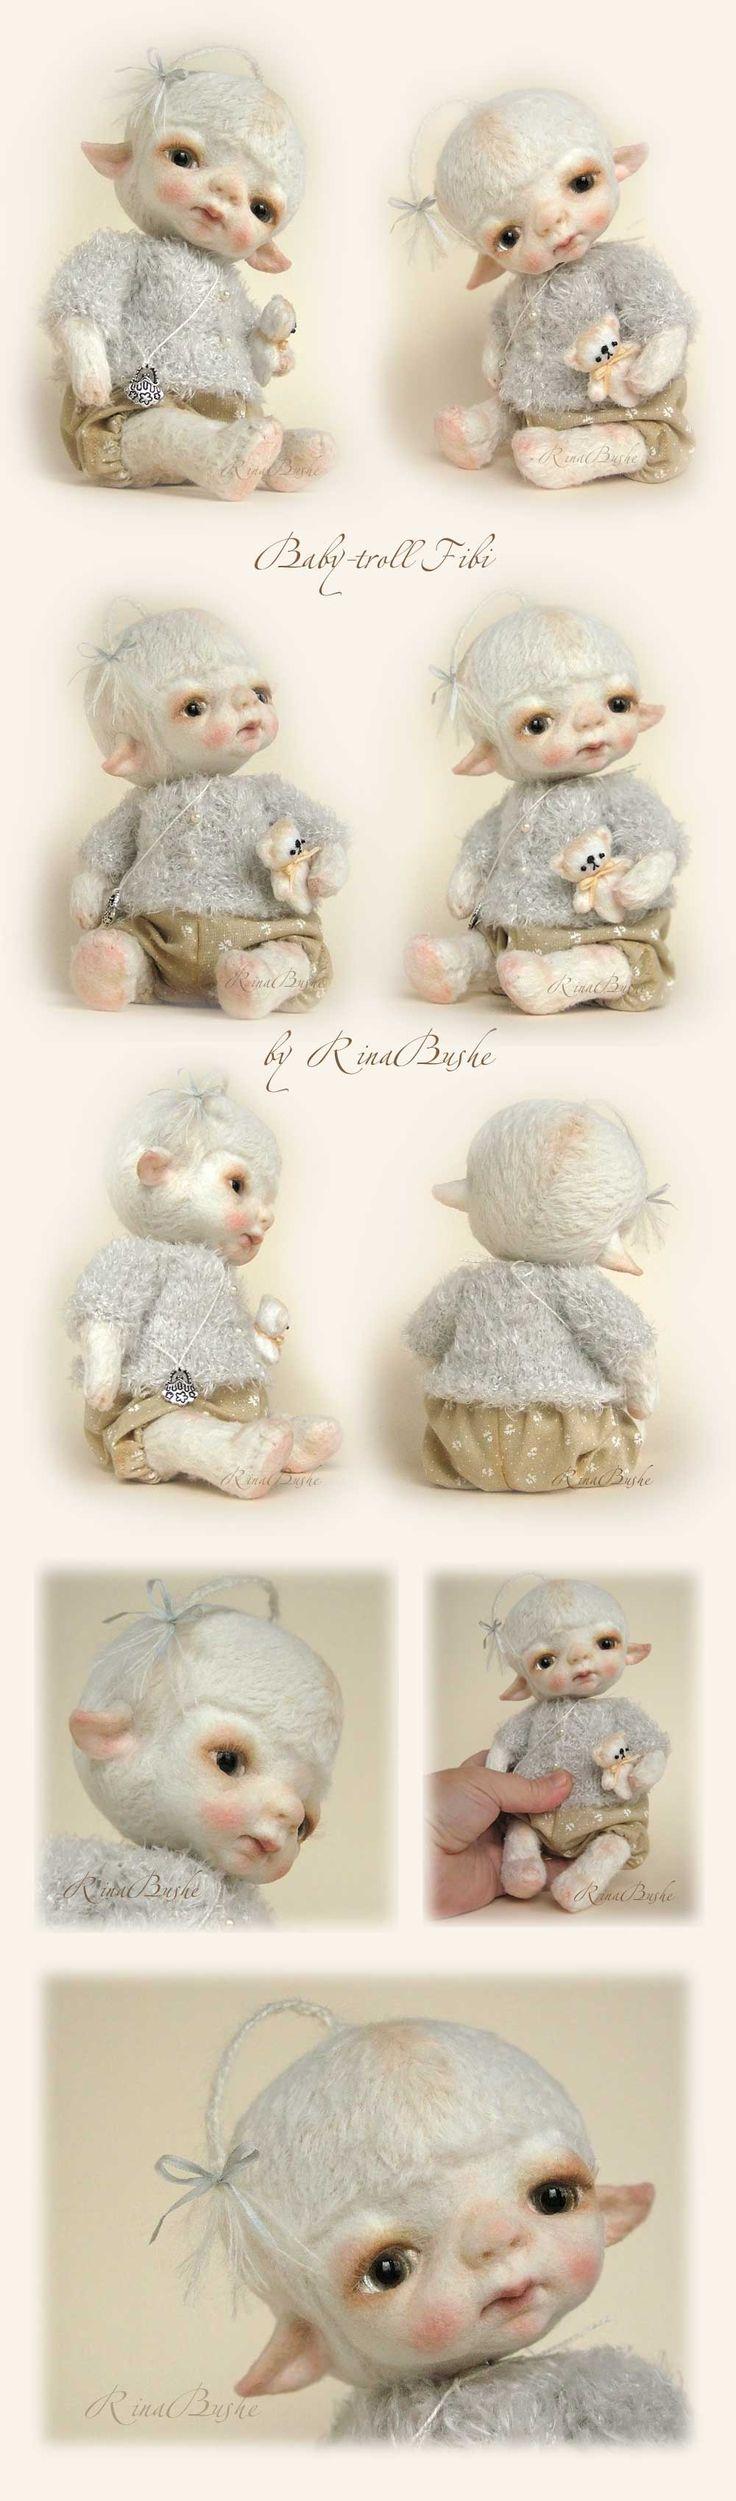 Felt dolls by Rina Bushe